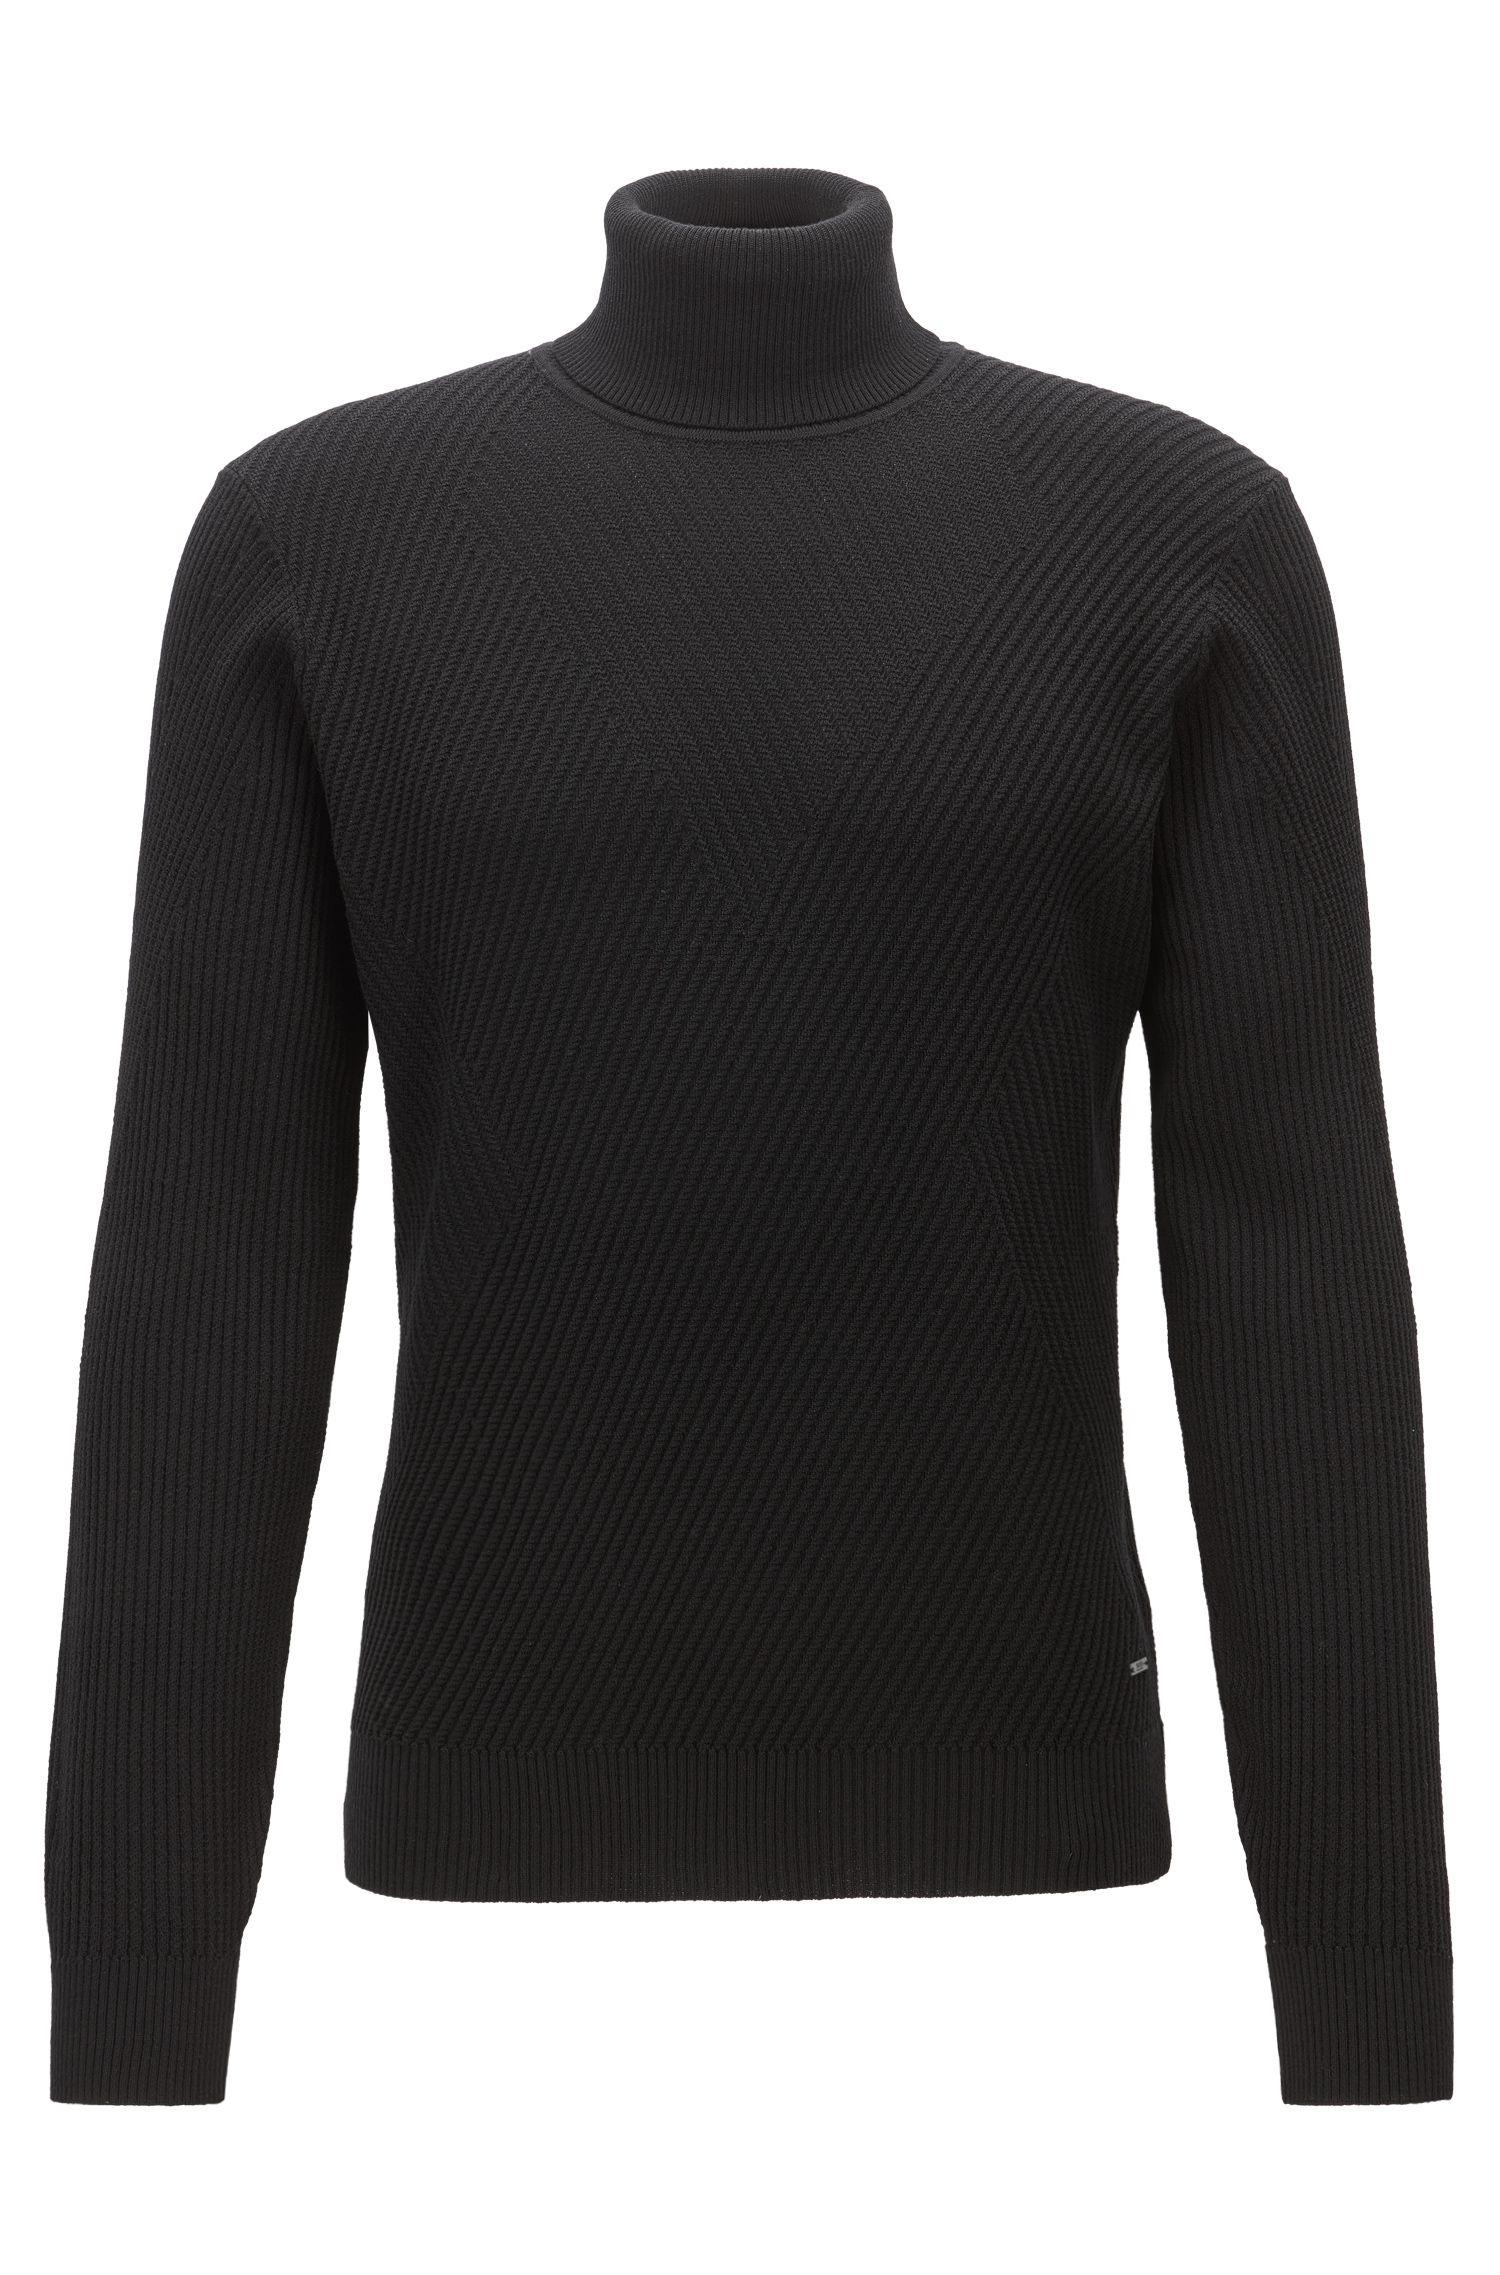 Ribbed Virgin Wool Sweater | Nazzaro